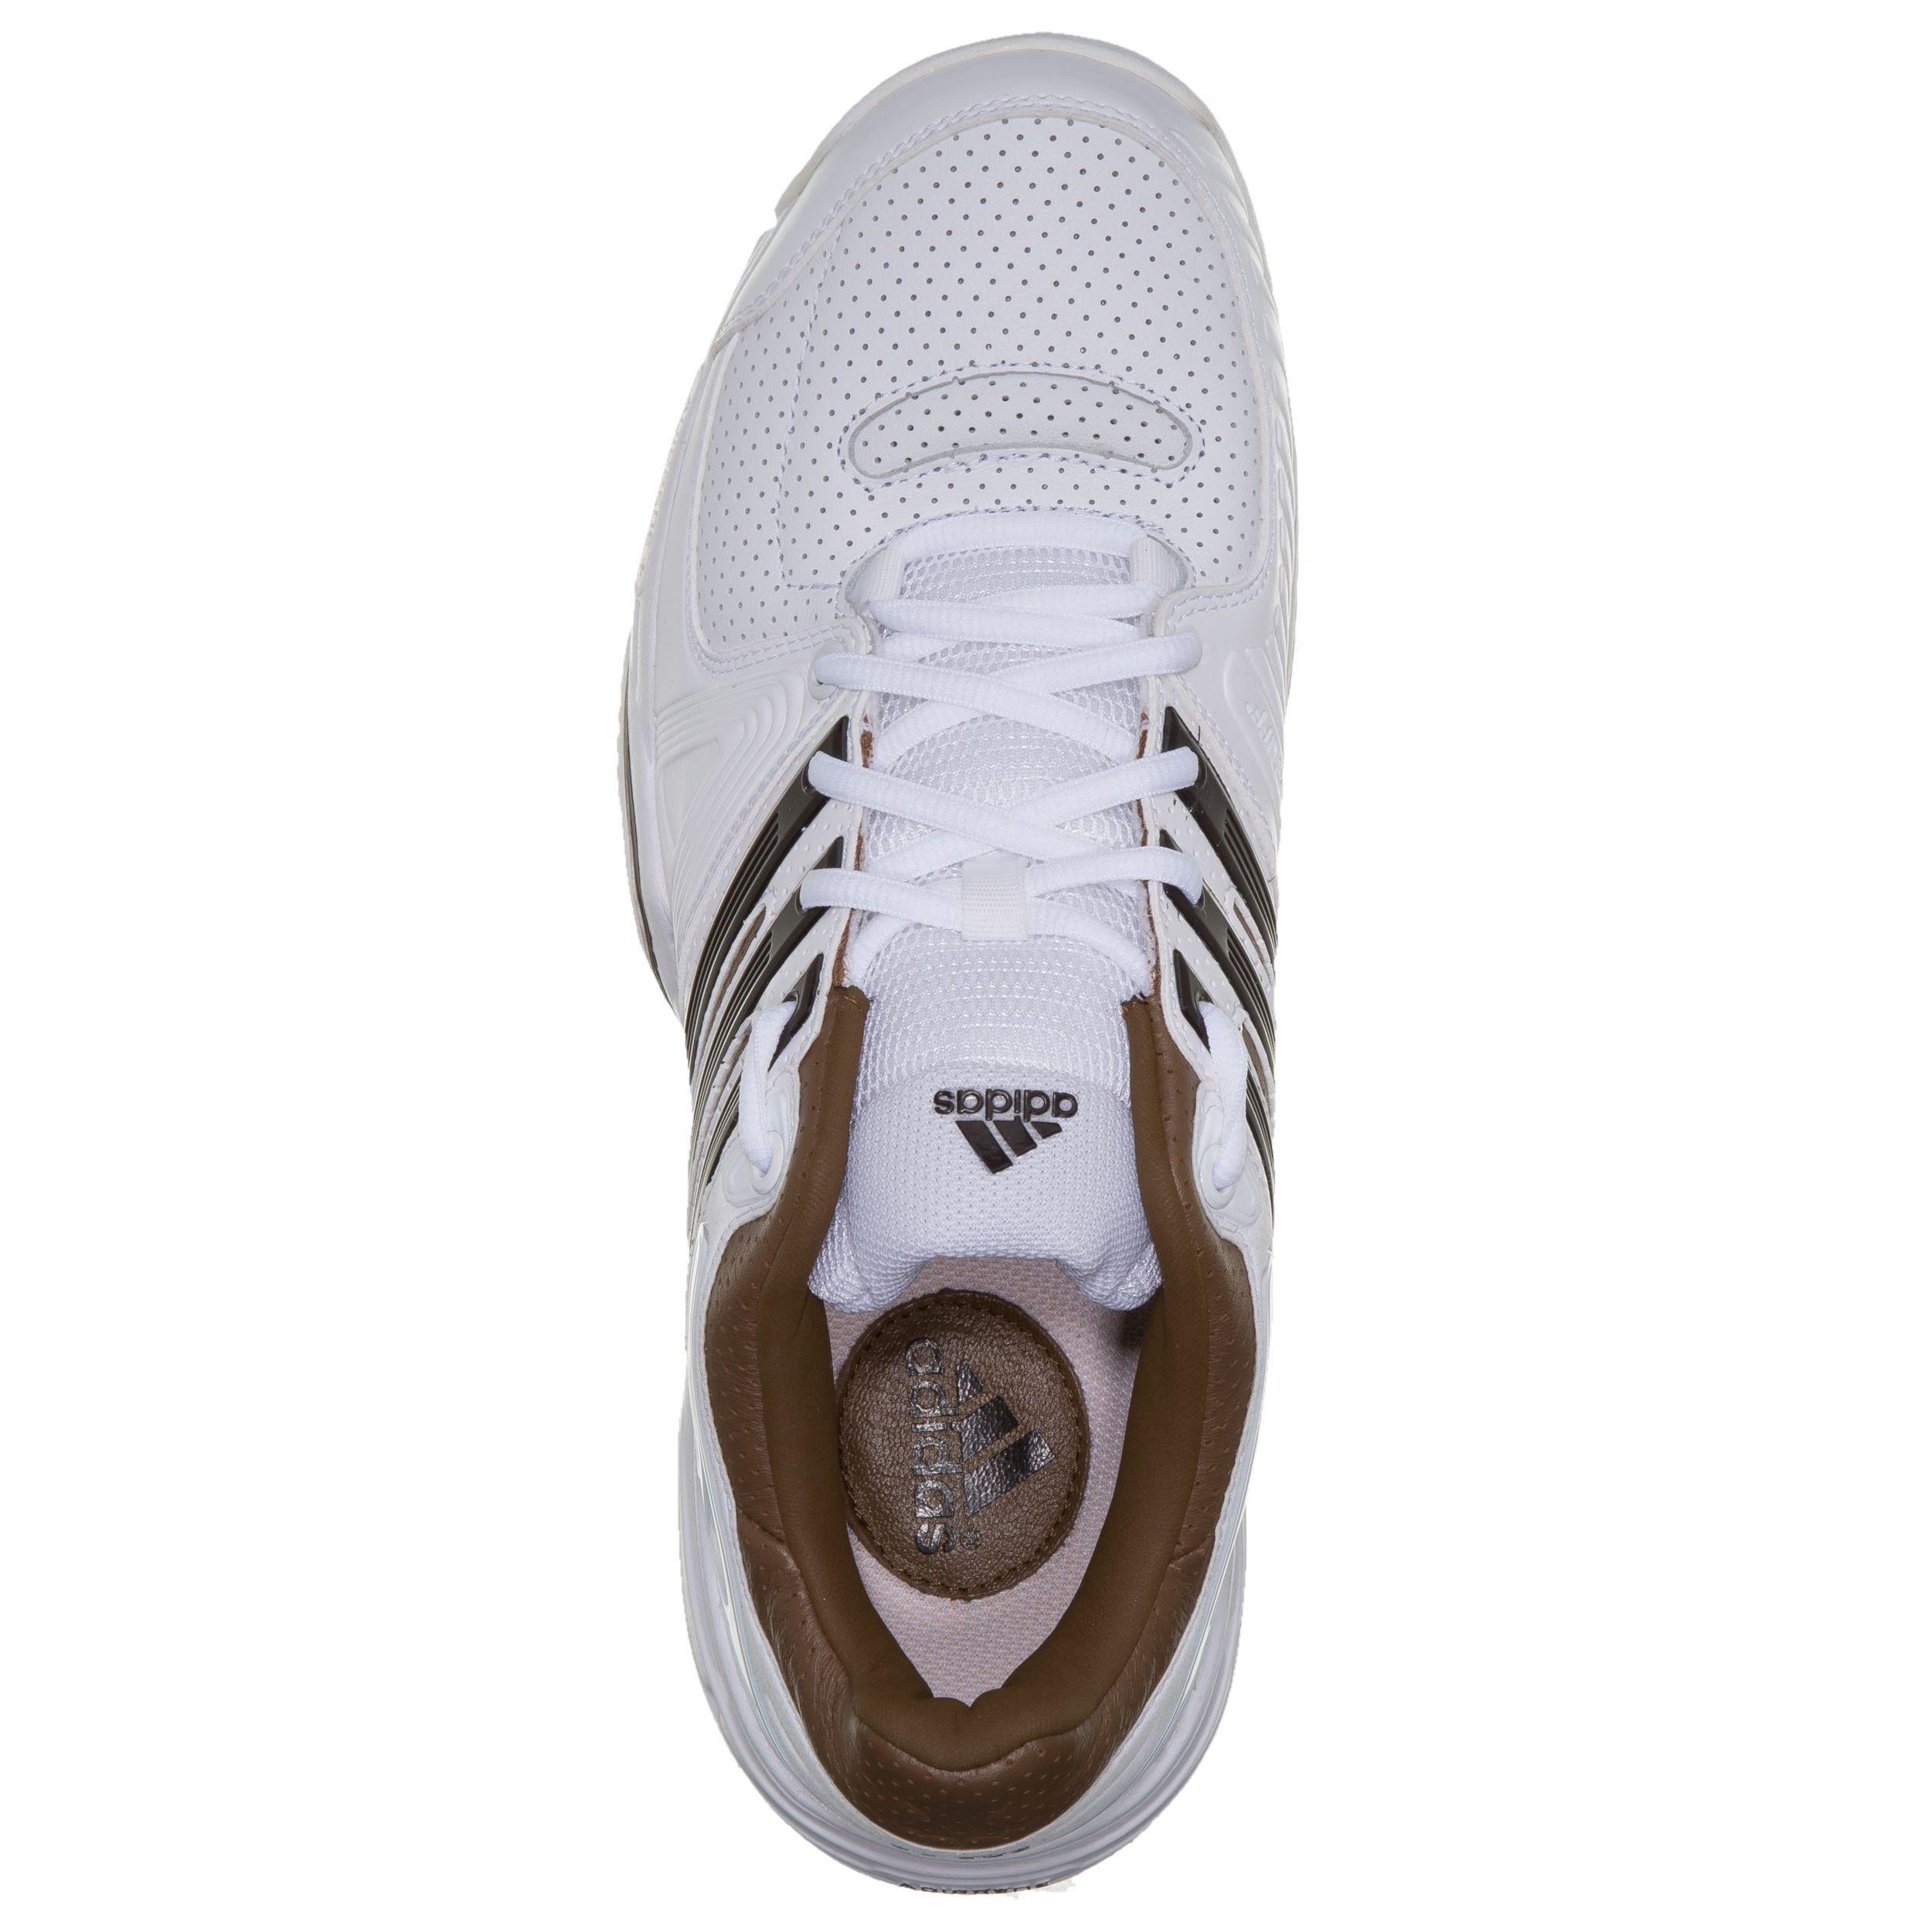 adidas Response Essence Leather Spezial Allroundsko Herrar Vit, Brun